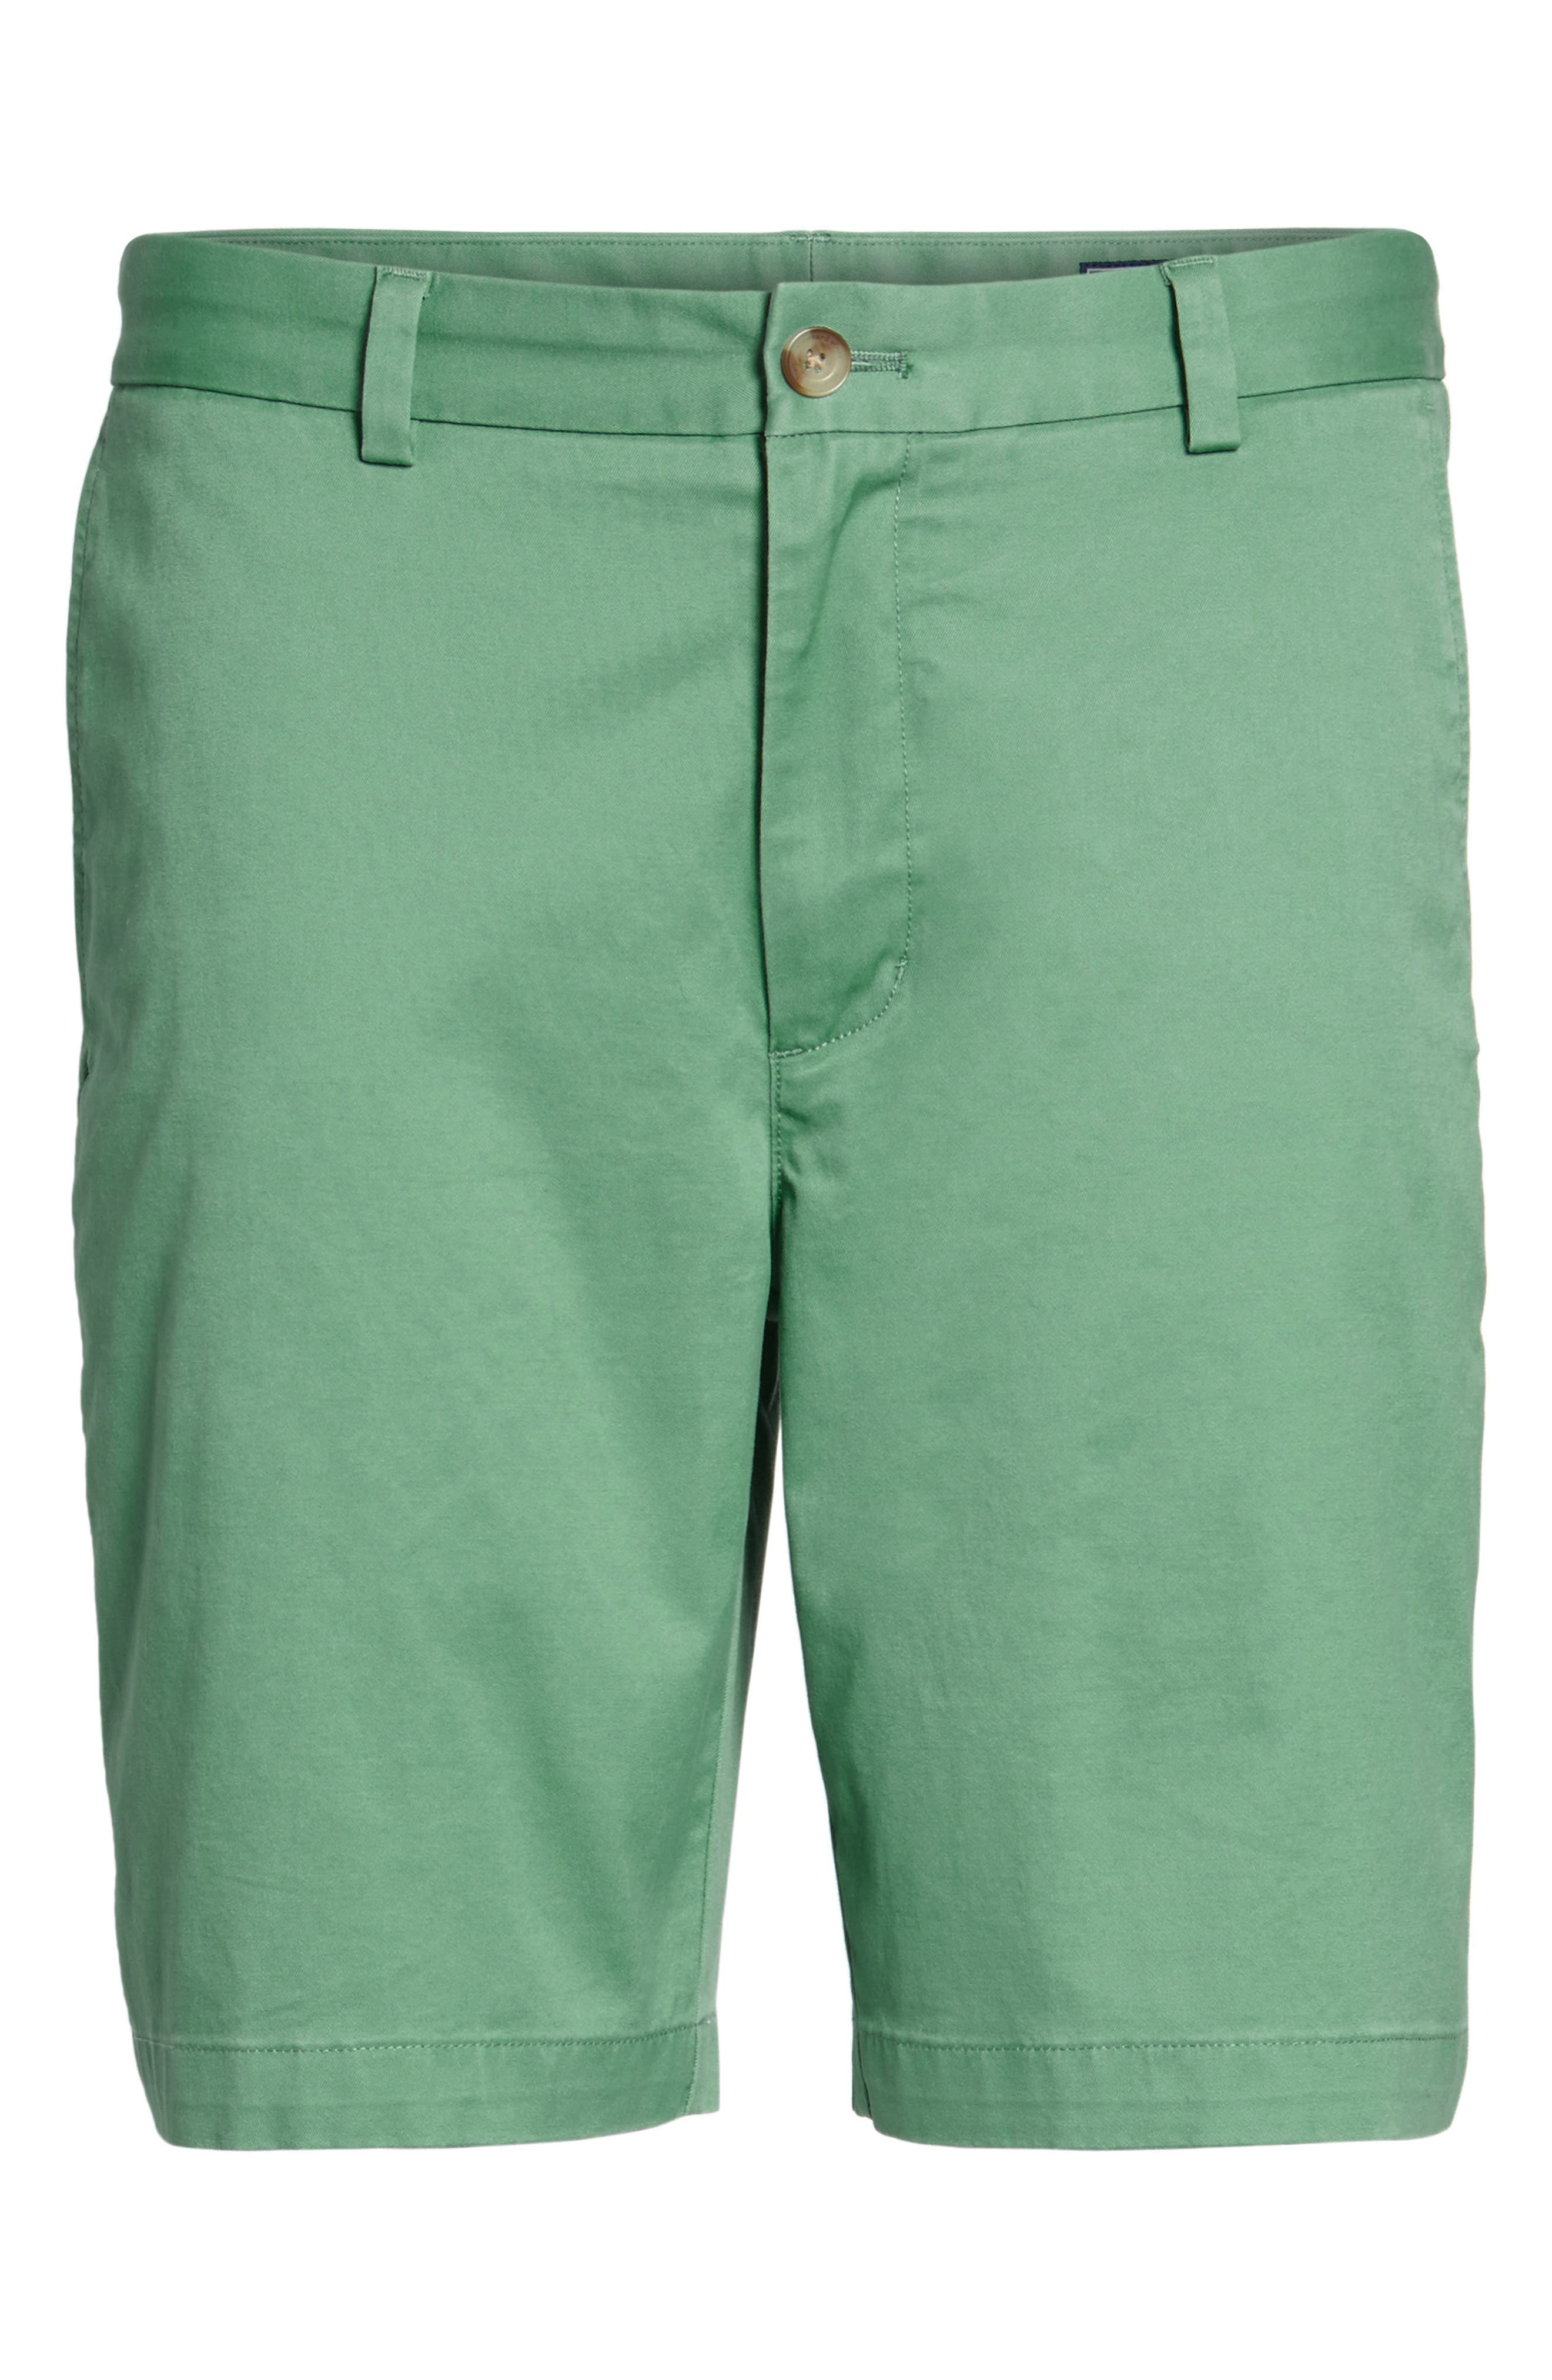 9 Inch Stretch Breaker Shorts,                             Alternate thumbnail 126, color,